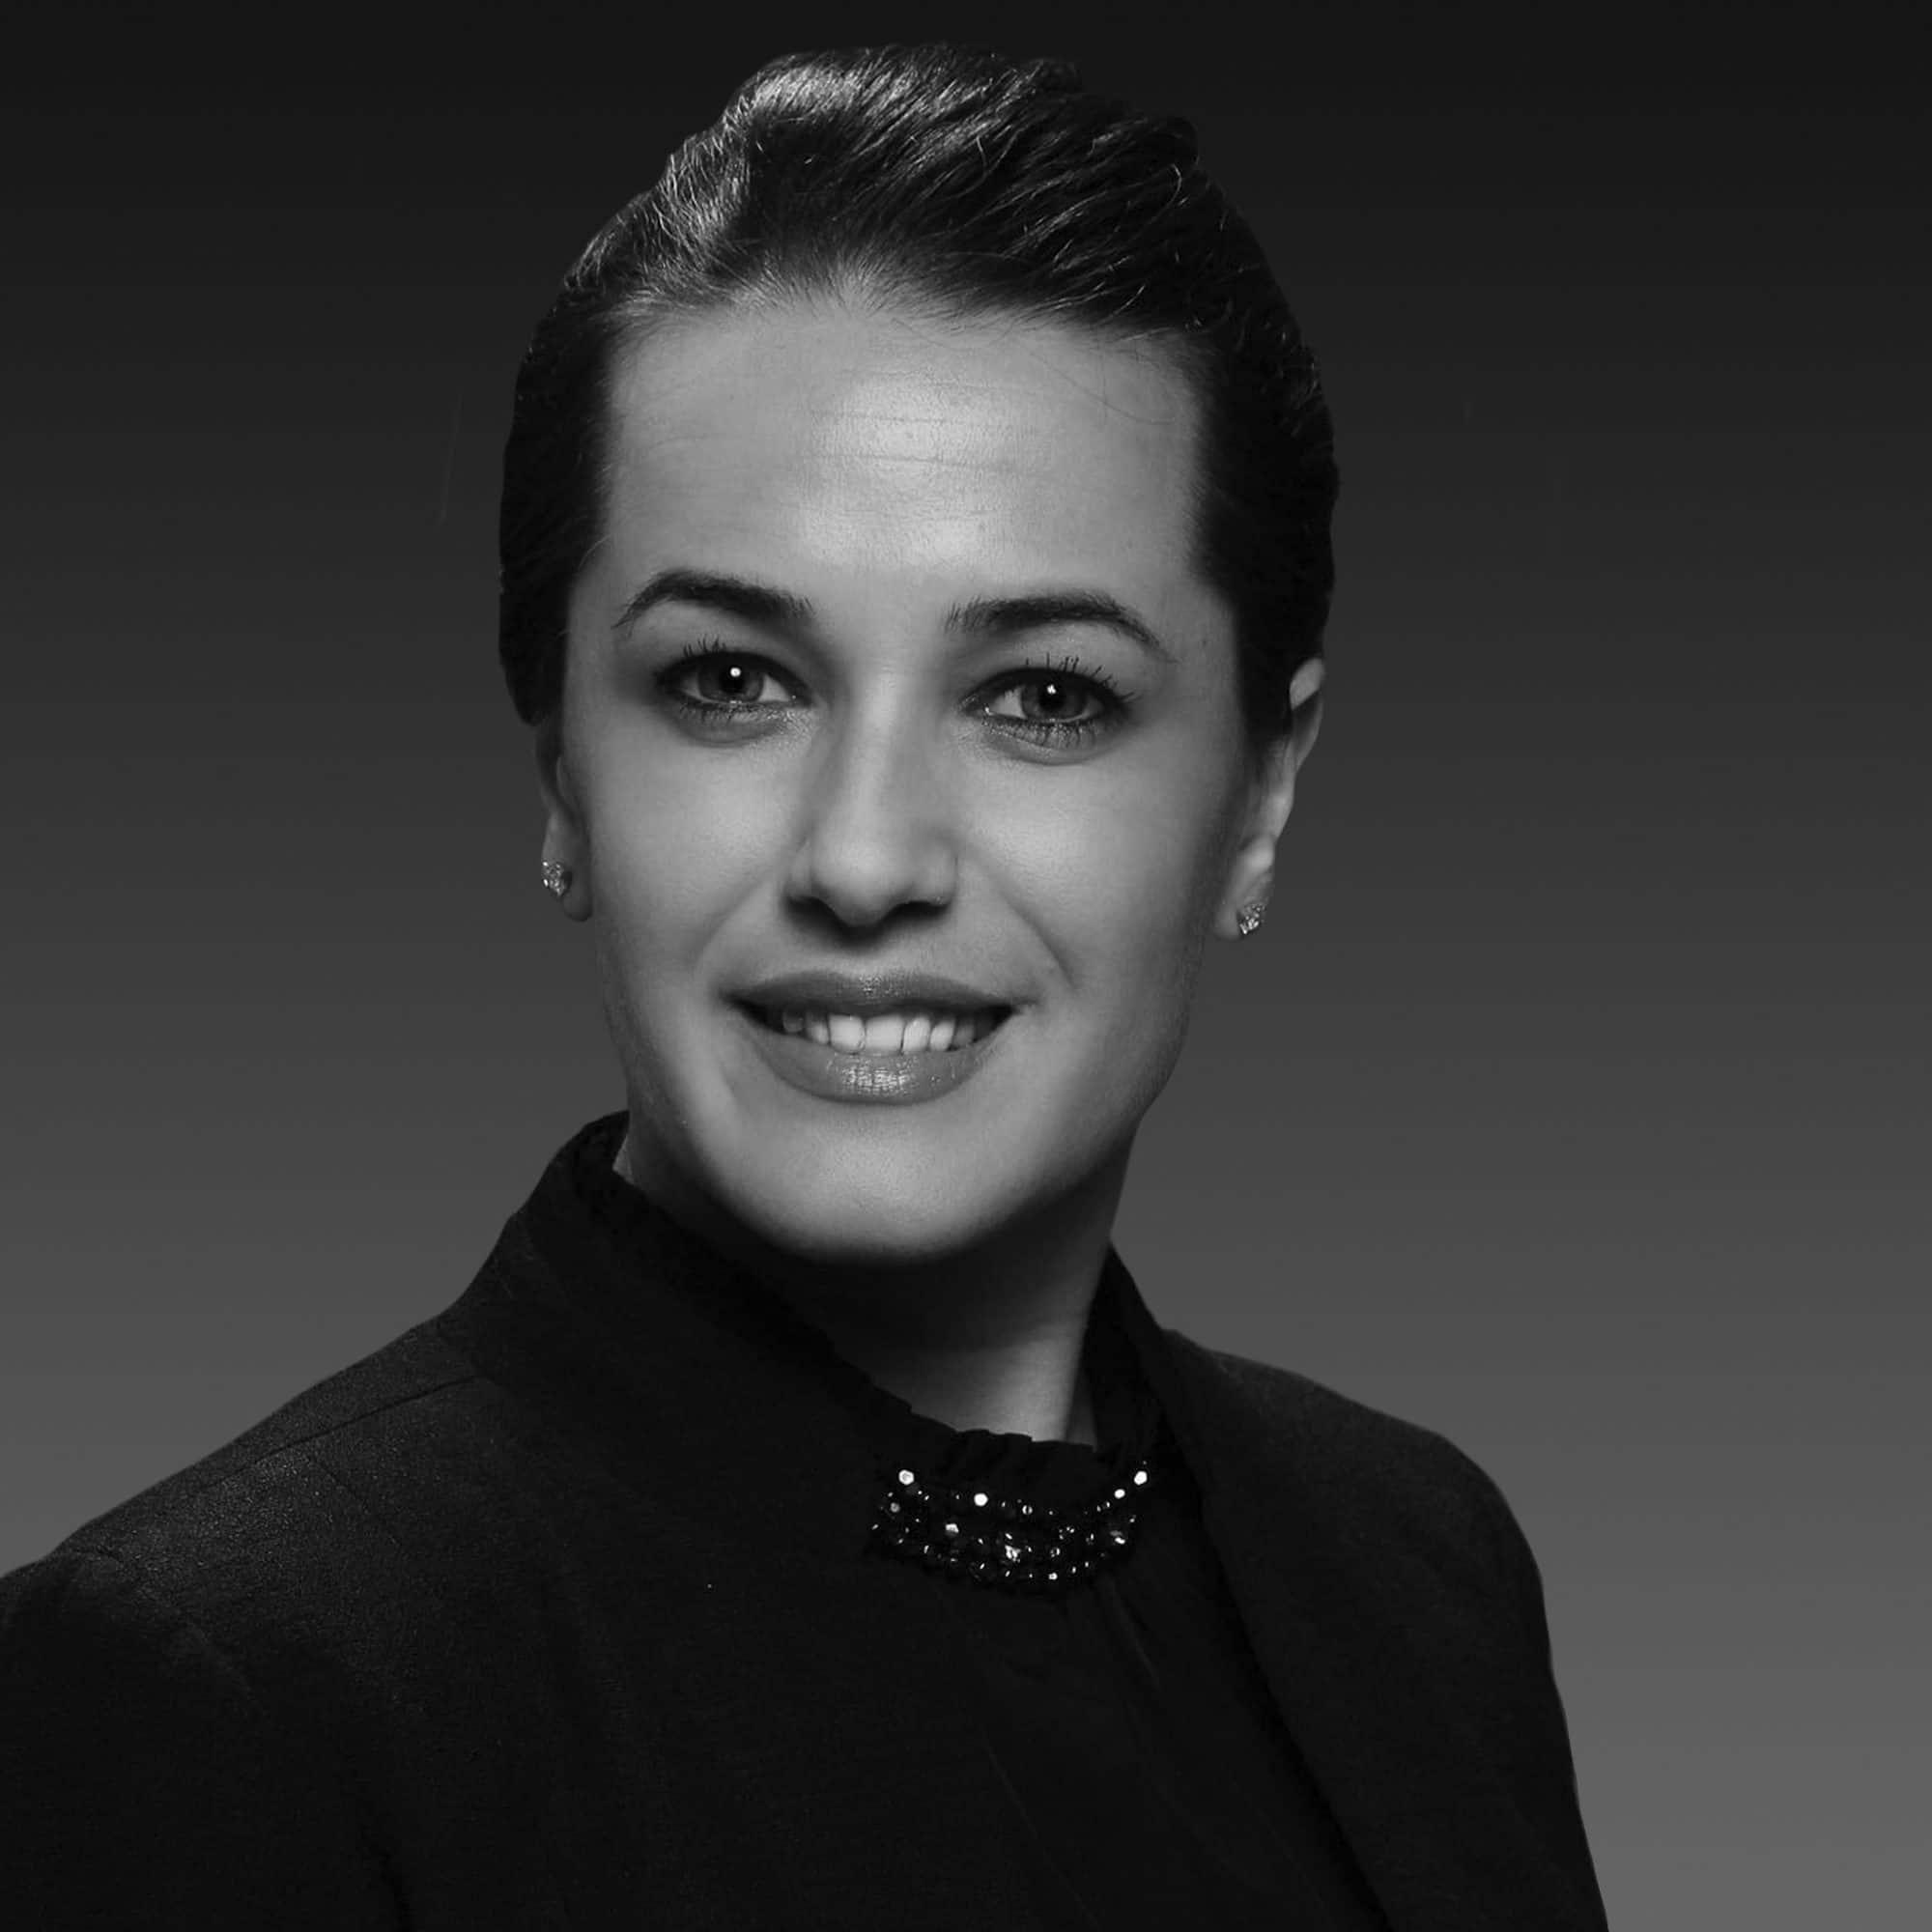 Elif Derya Bakkal